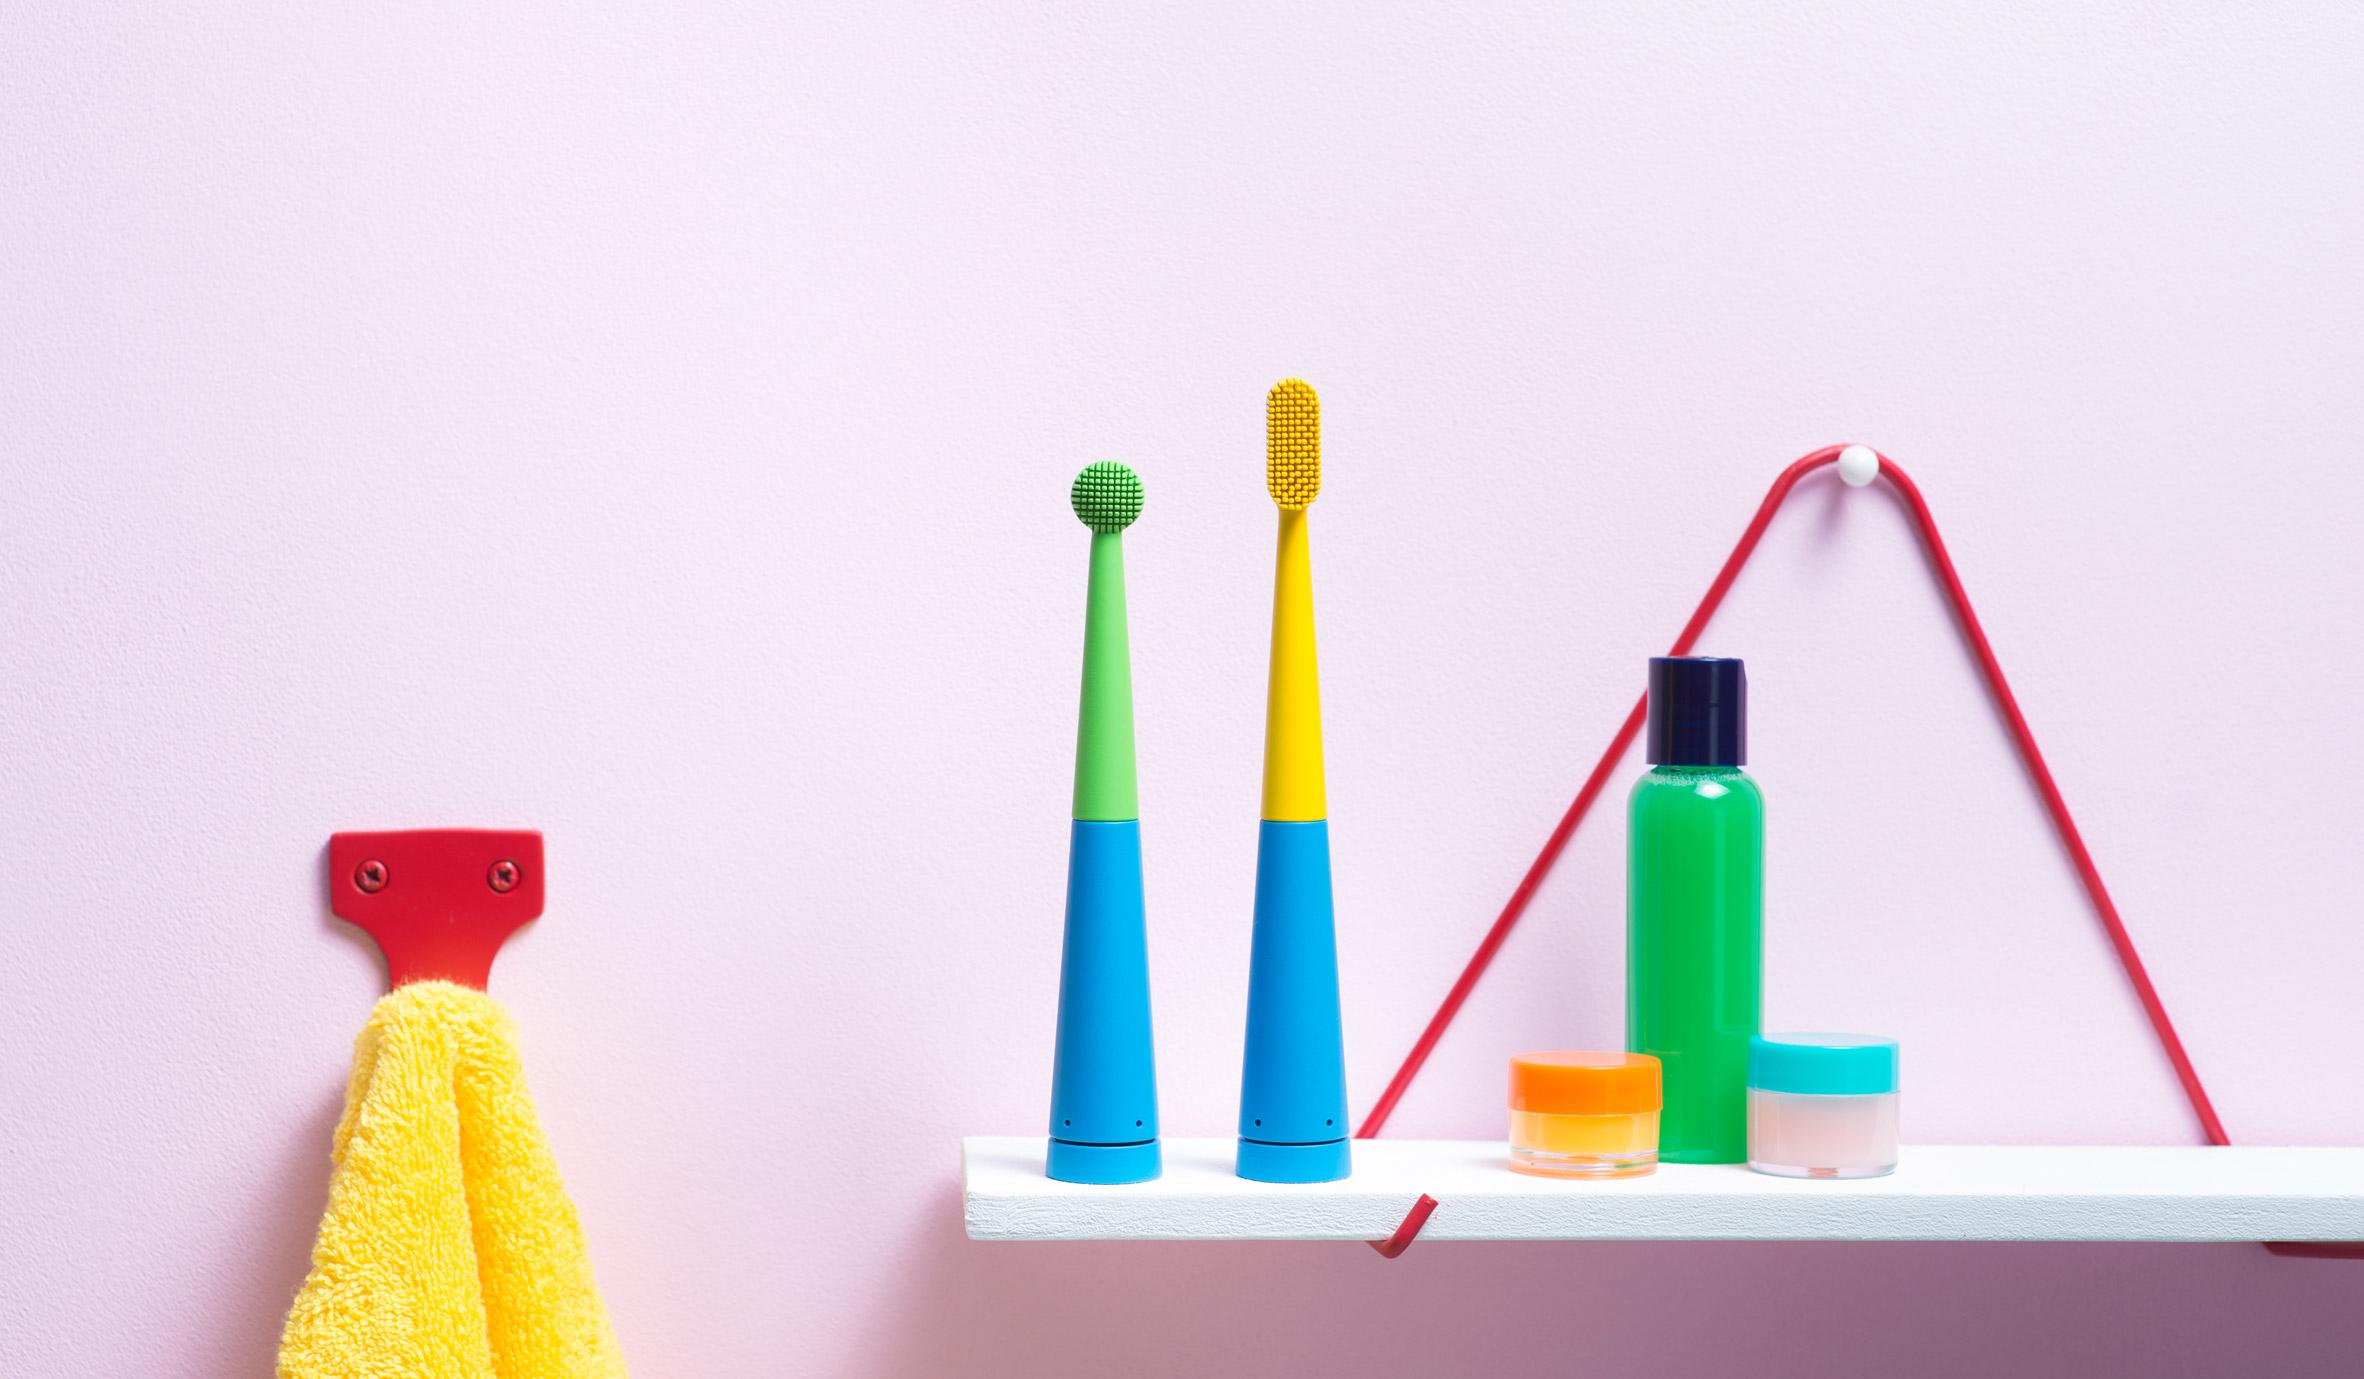 BleepBleeps launches smart musical toothbrush that tracks brushing habits